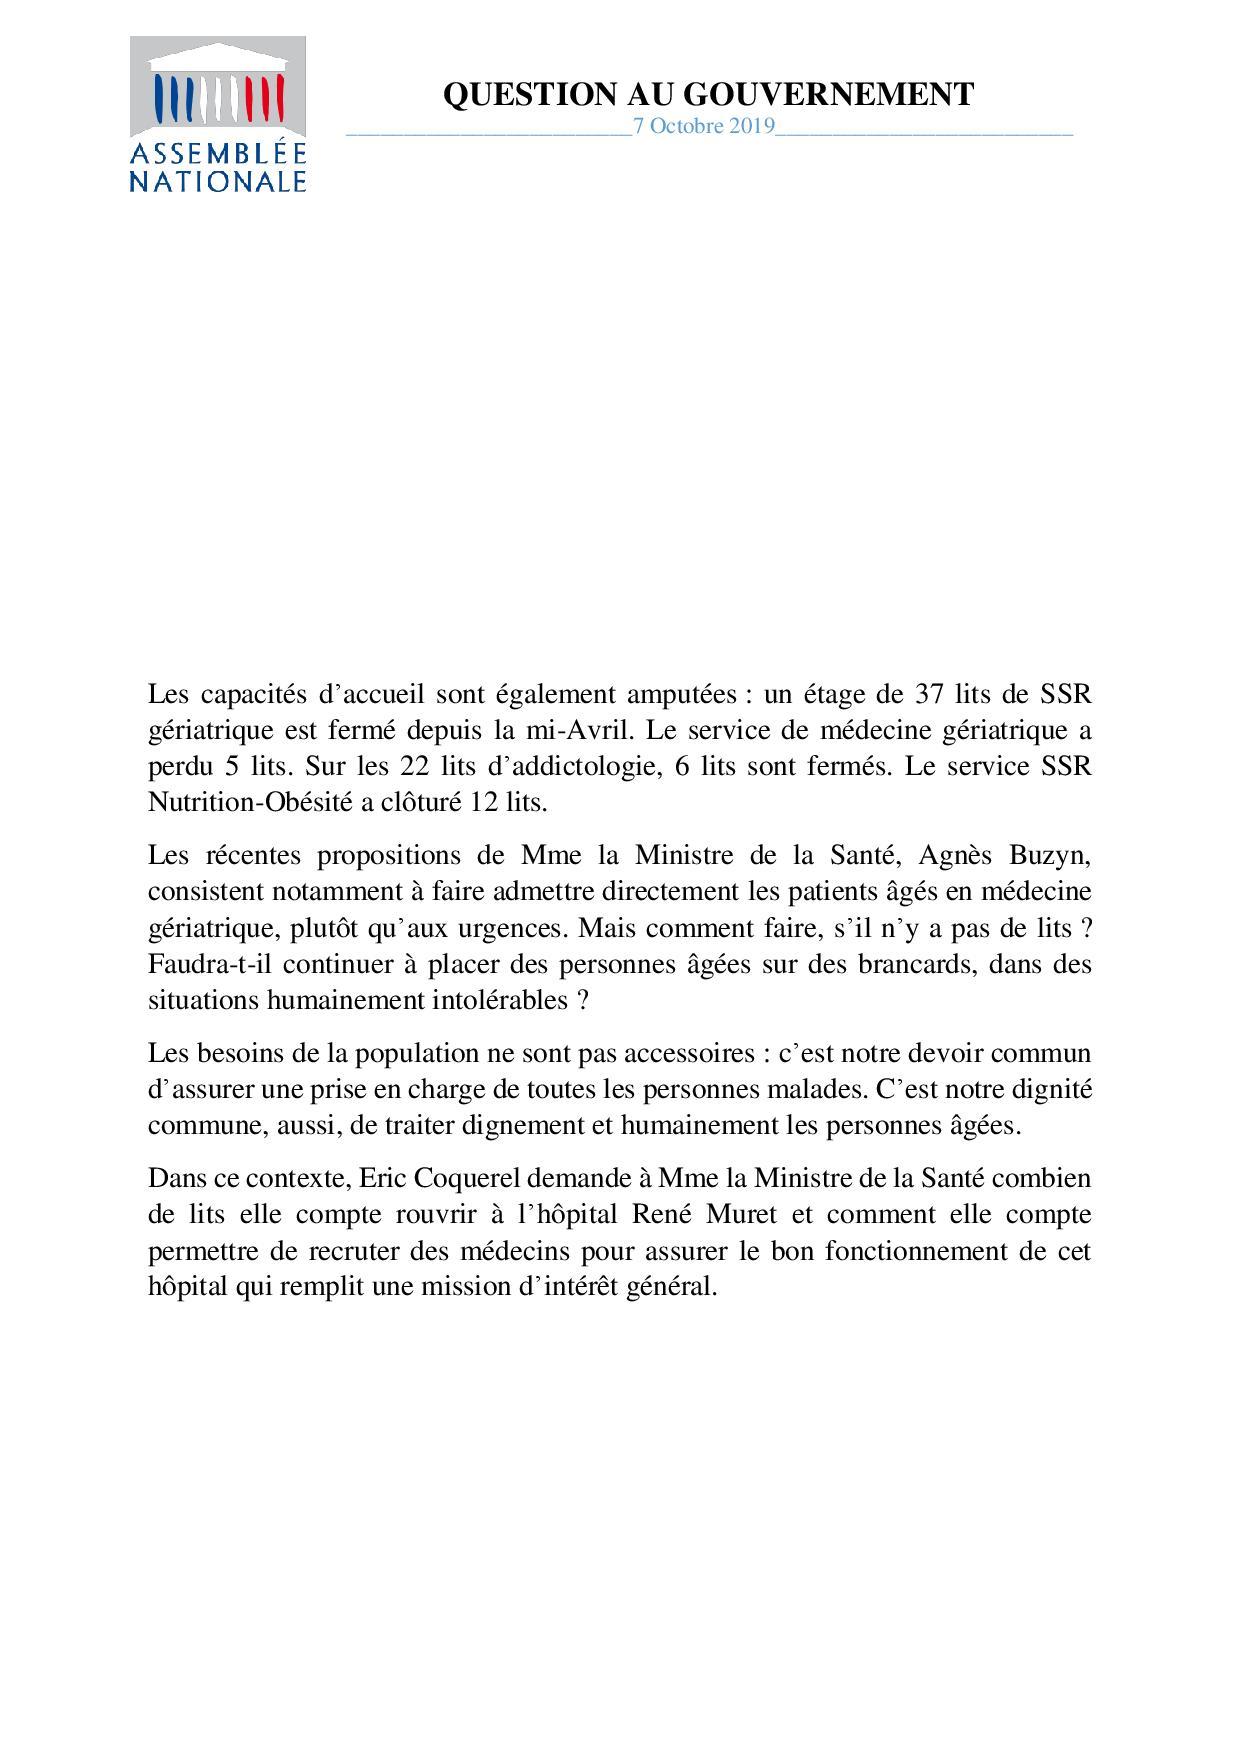 07-10-2019 Hopital rene muret-page-002